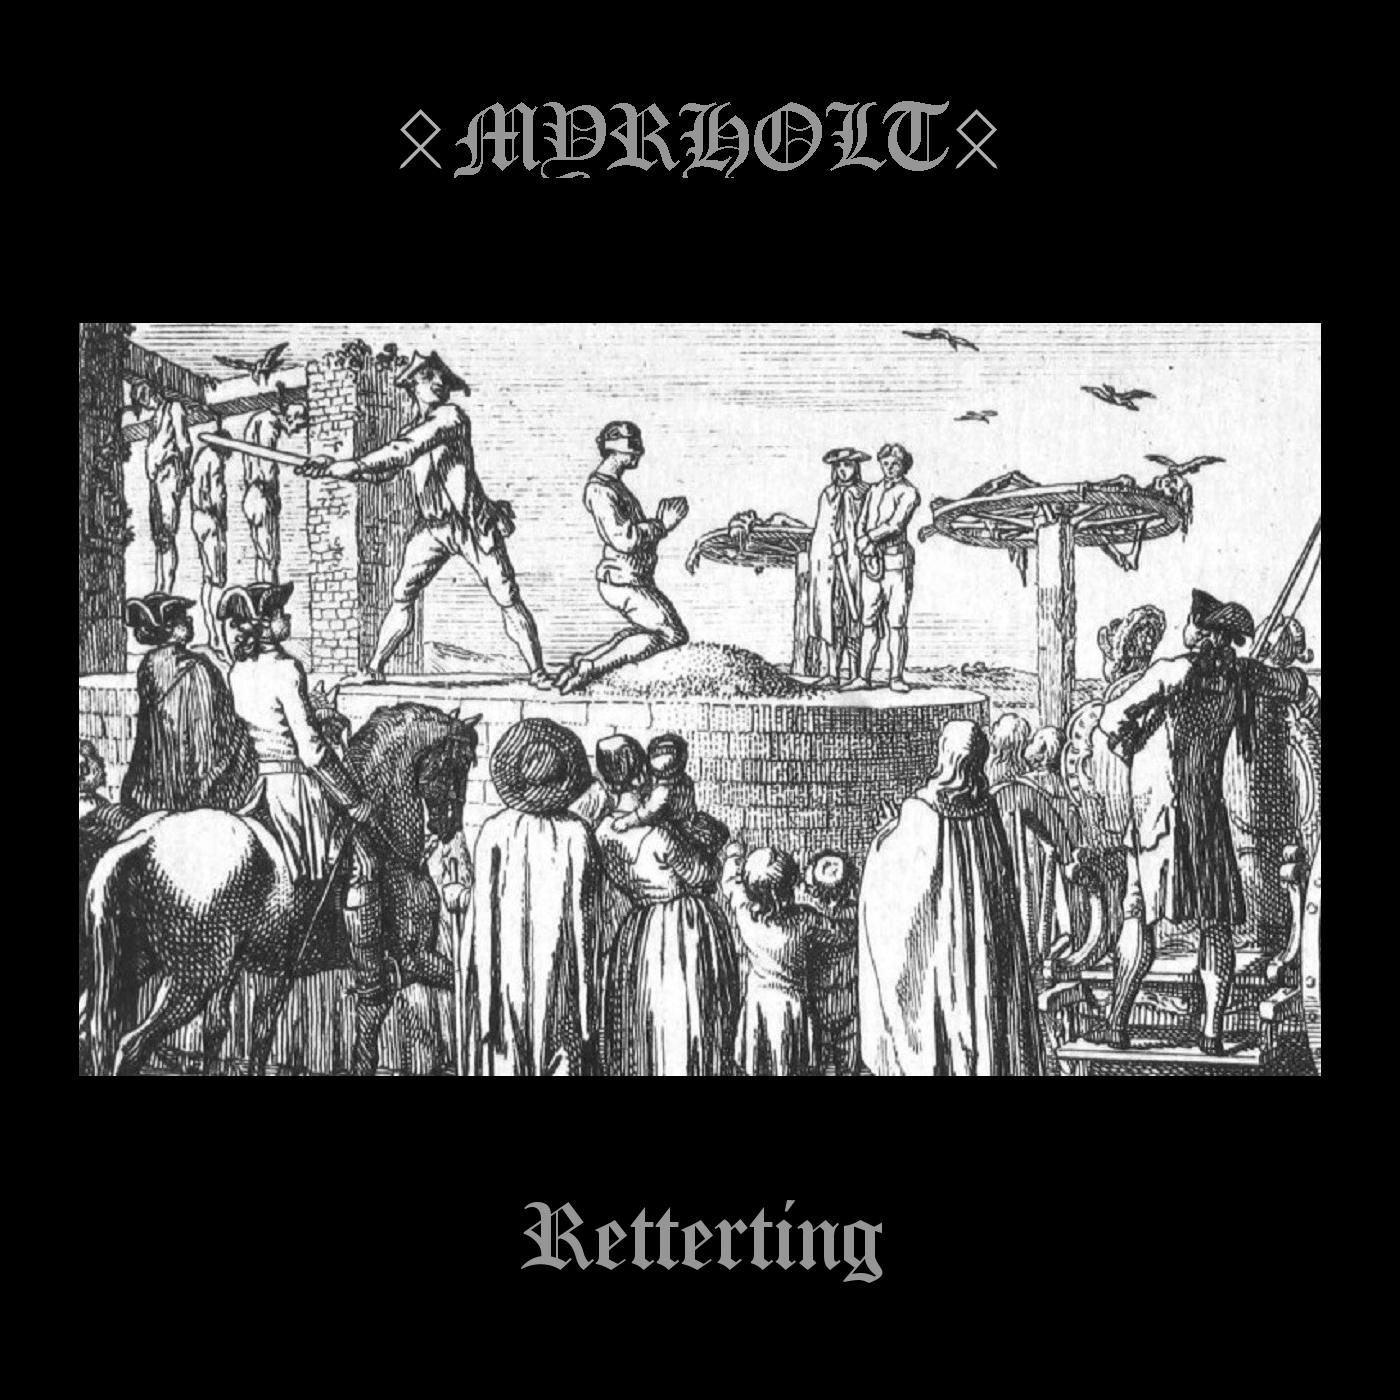 OccultBlackMetalZine: Myrholt/Retterting/Screaming Skull Records/Darker  than Black Records/2020 EP Review